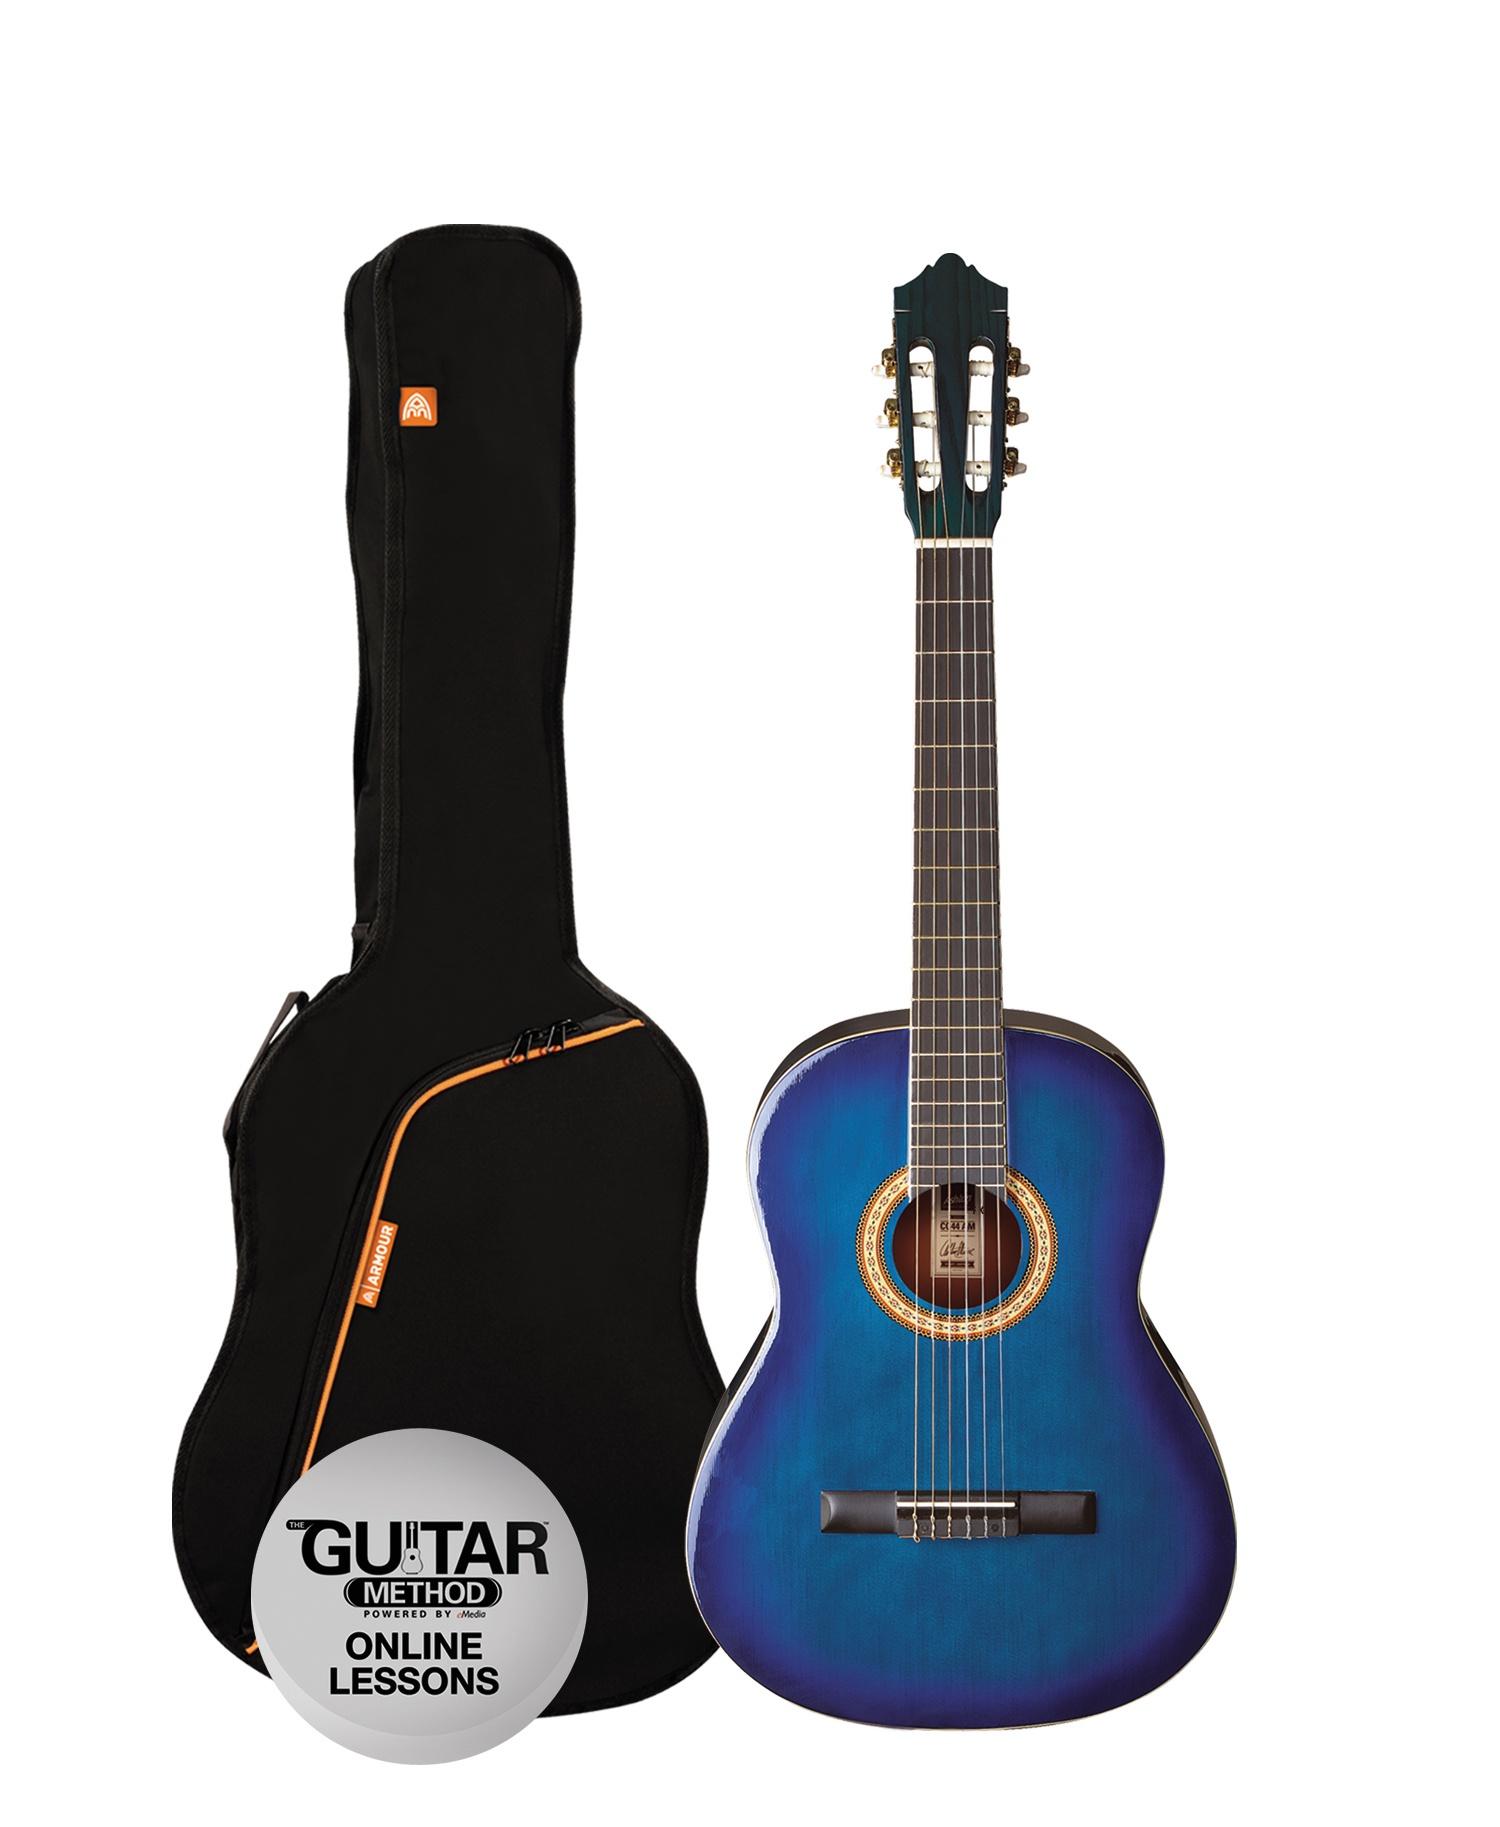 Ashton 1 2 Size Classic Guitar Pack The Family Music Store